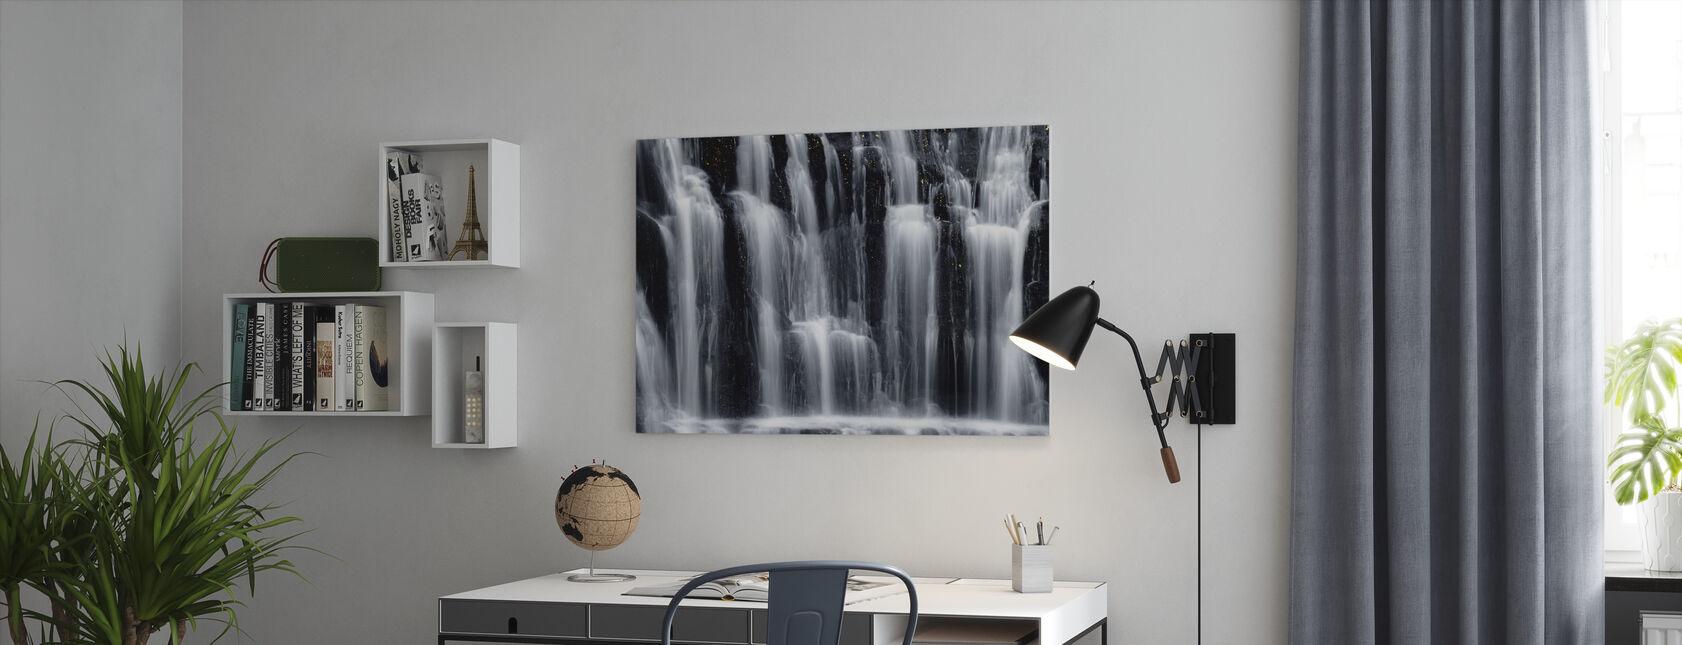 Sparkling - Canvas print - Office